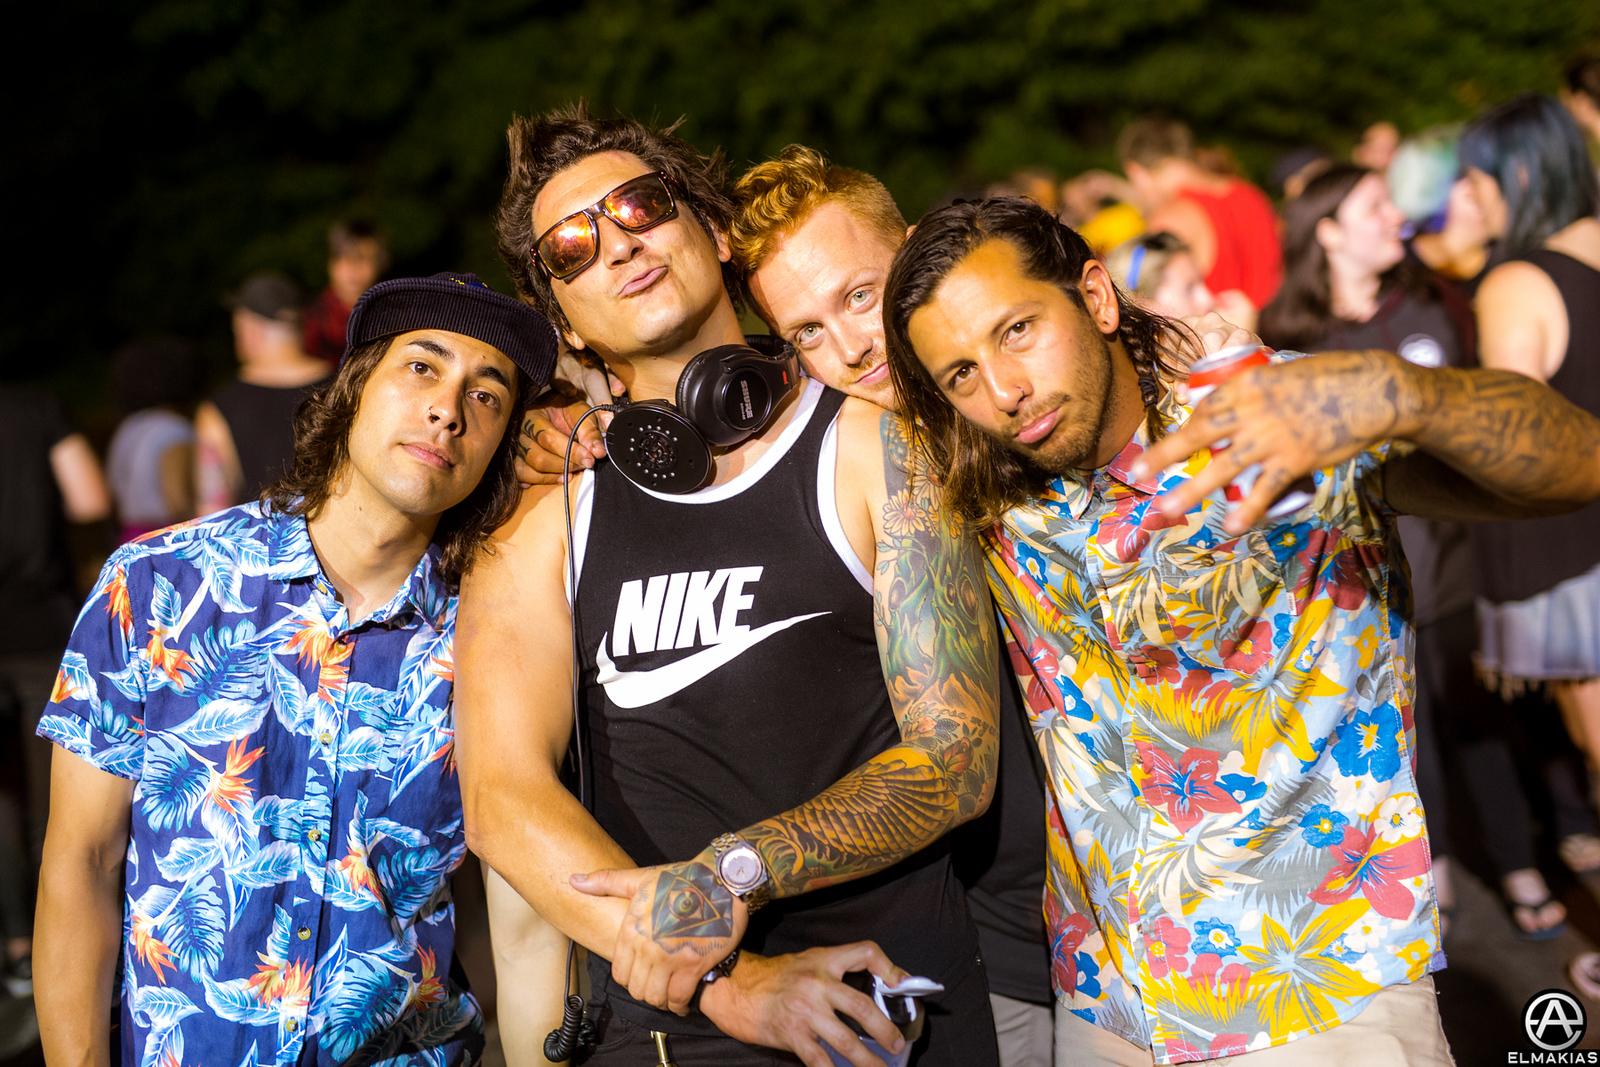 Vic Fuentes, Jaime Preciado of Pierce the Veil, Eric Lambert of Blessthefall, Ricky at Warped Tour 2015 by Adam Elmakias